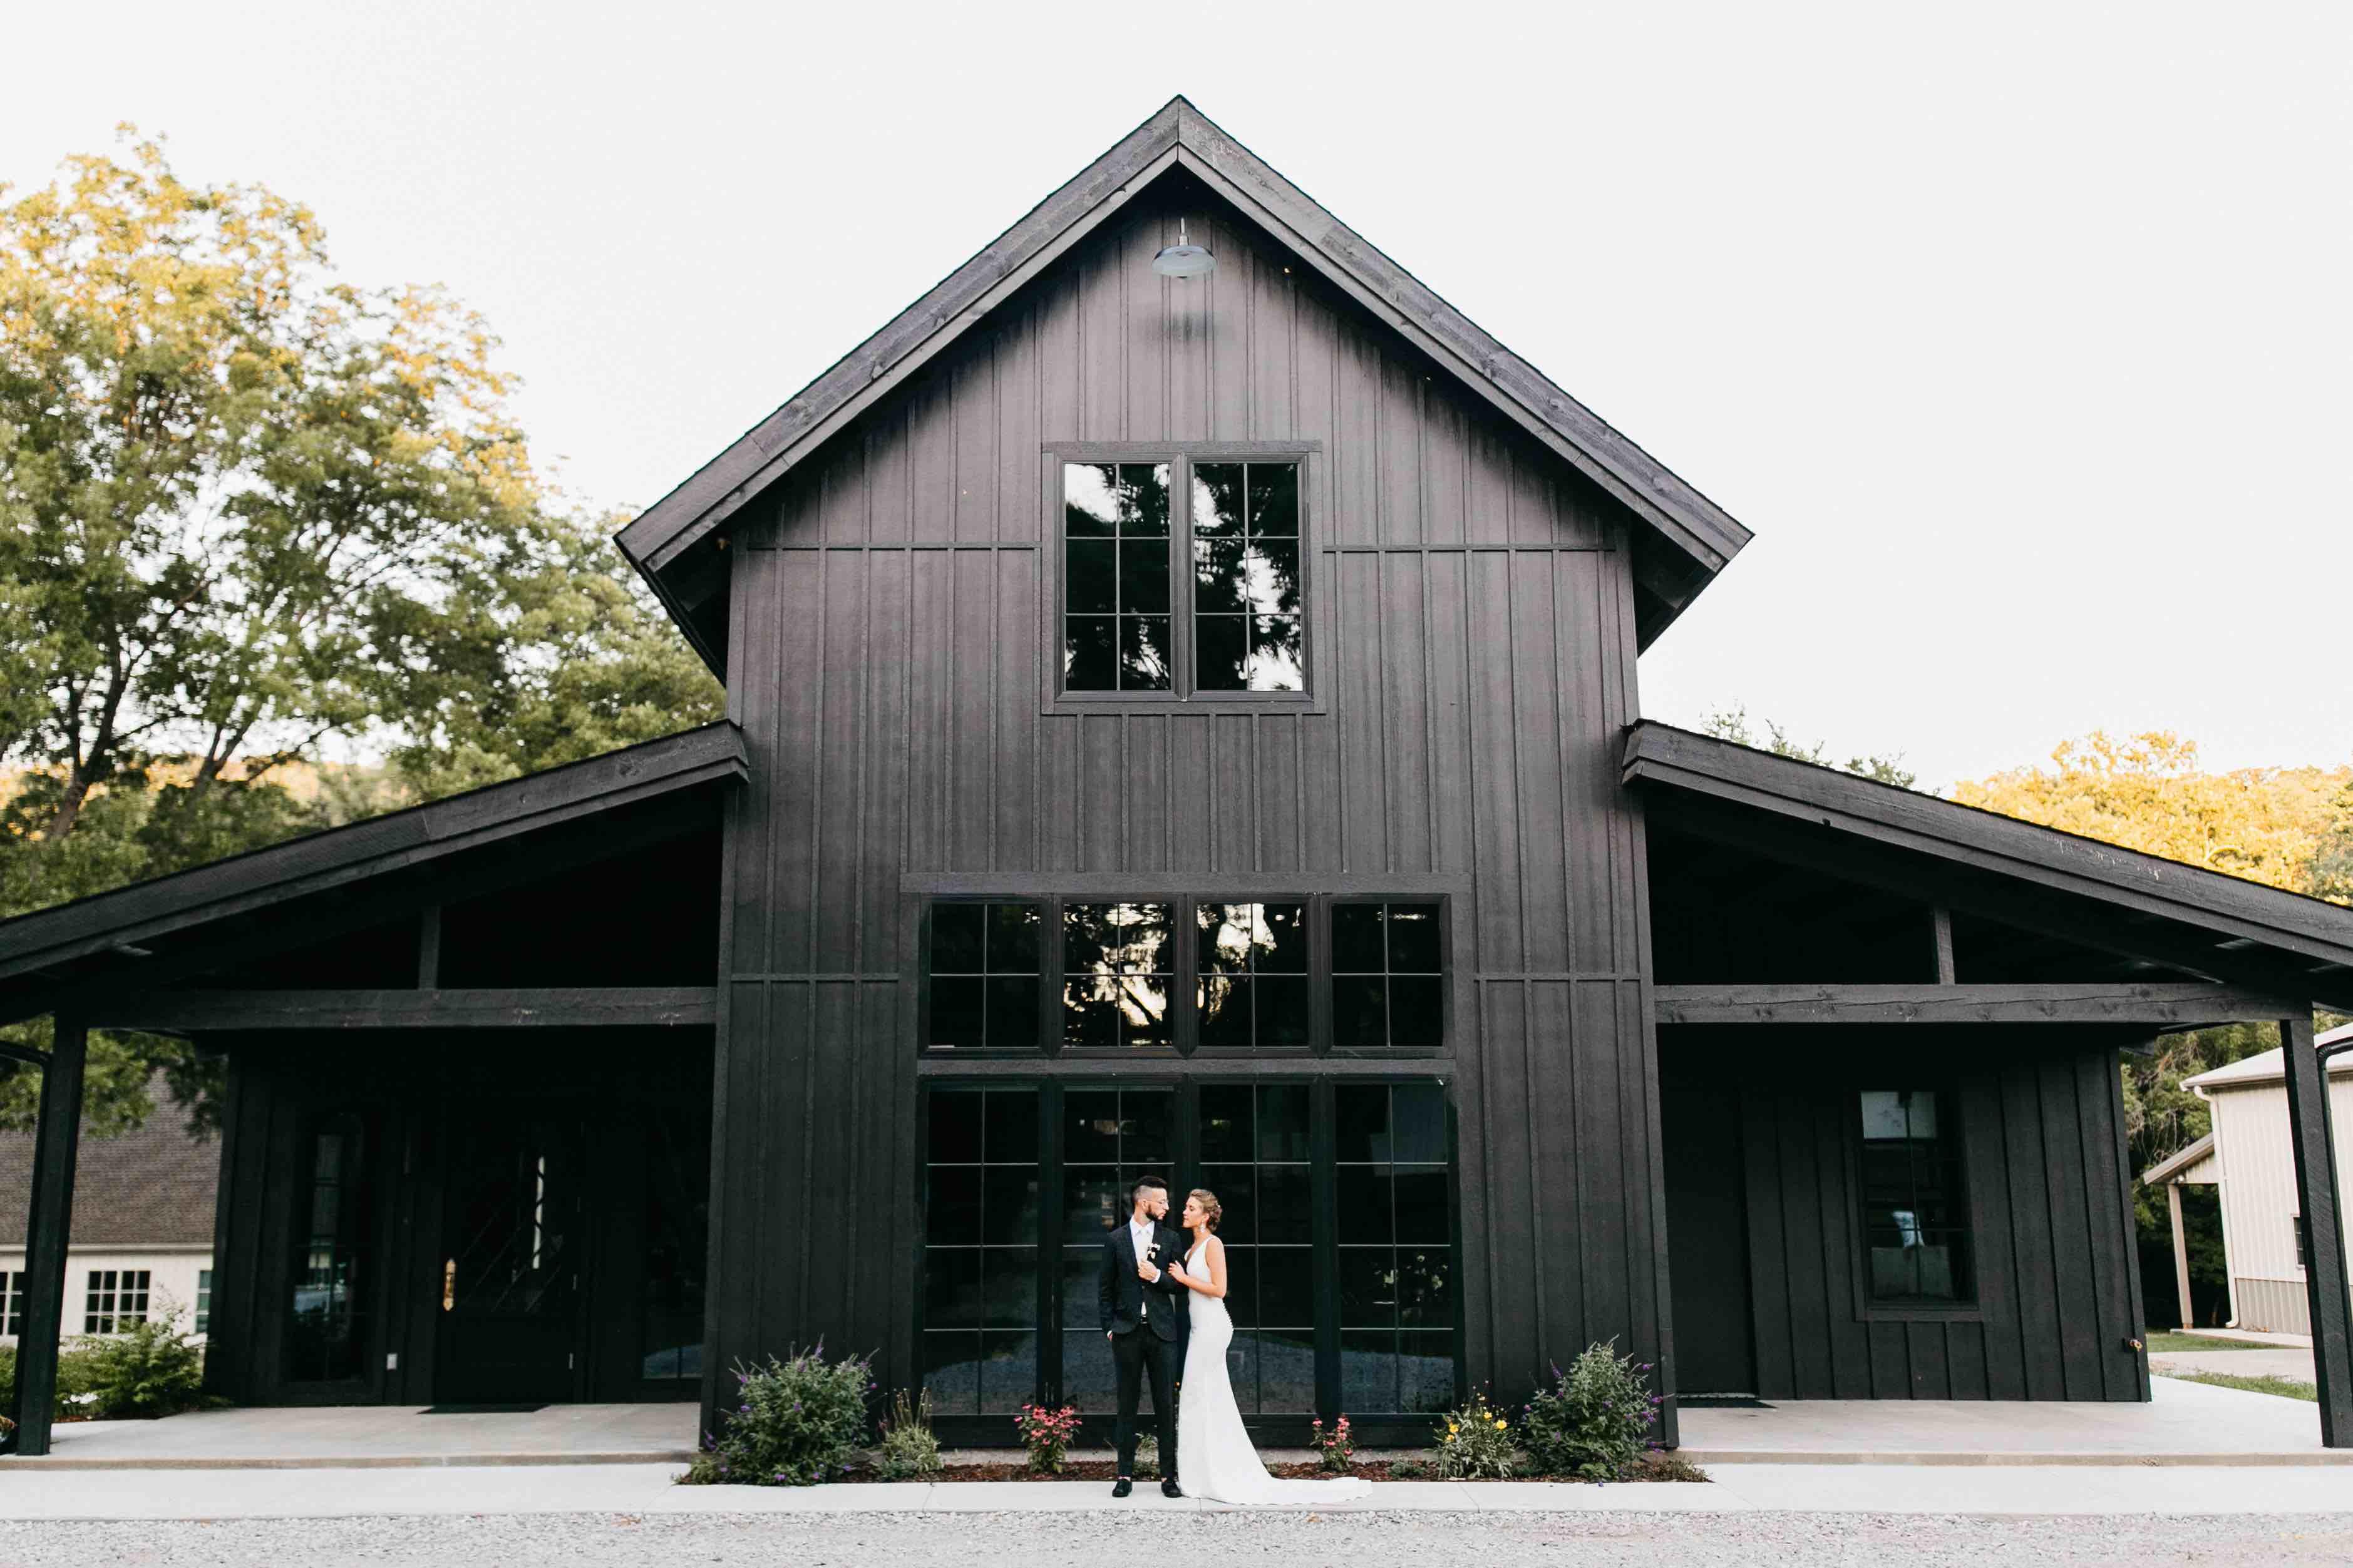 The Black Barn at Spain Ranch Venues